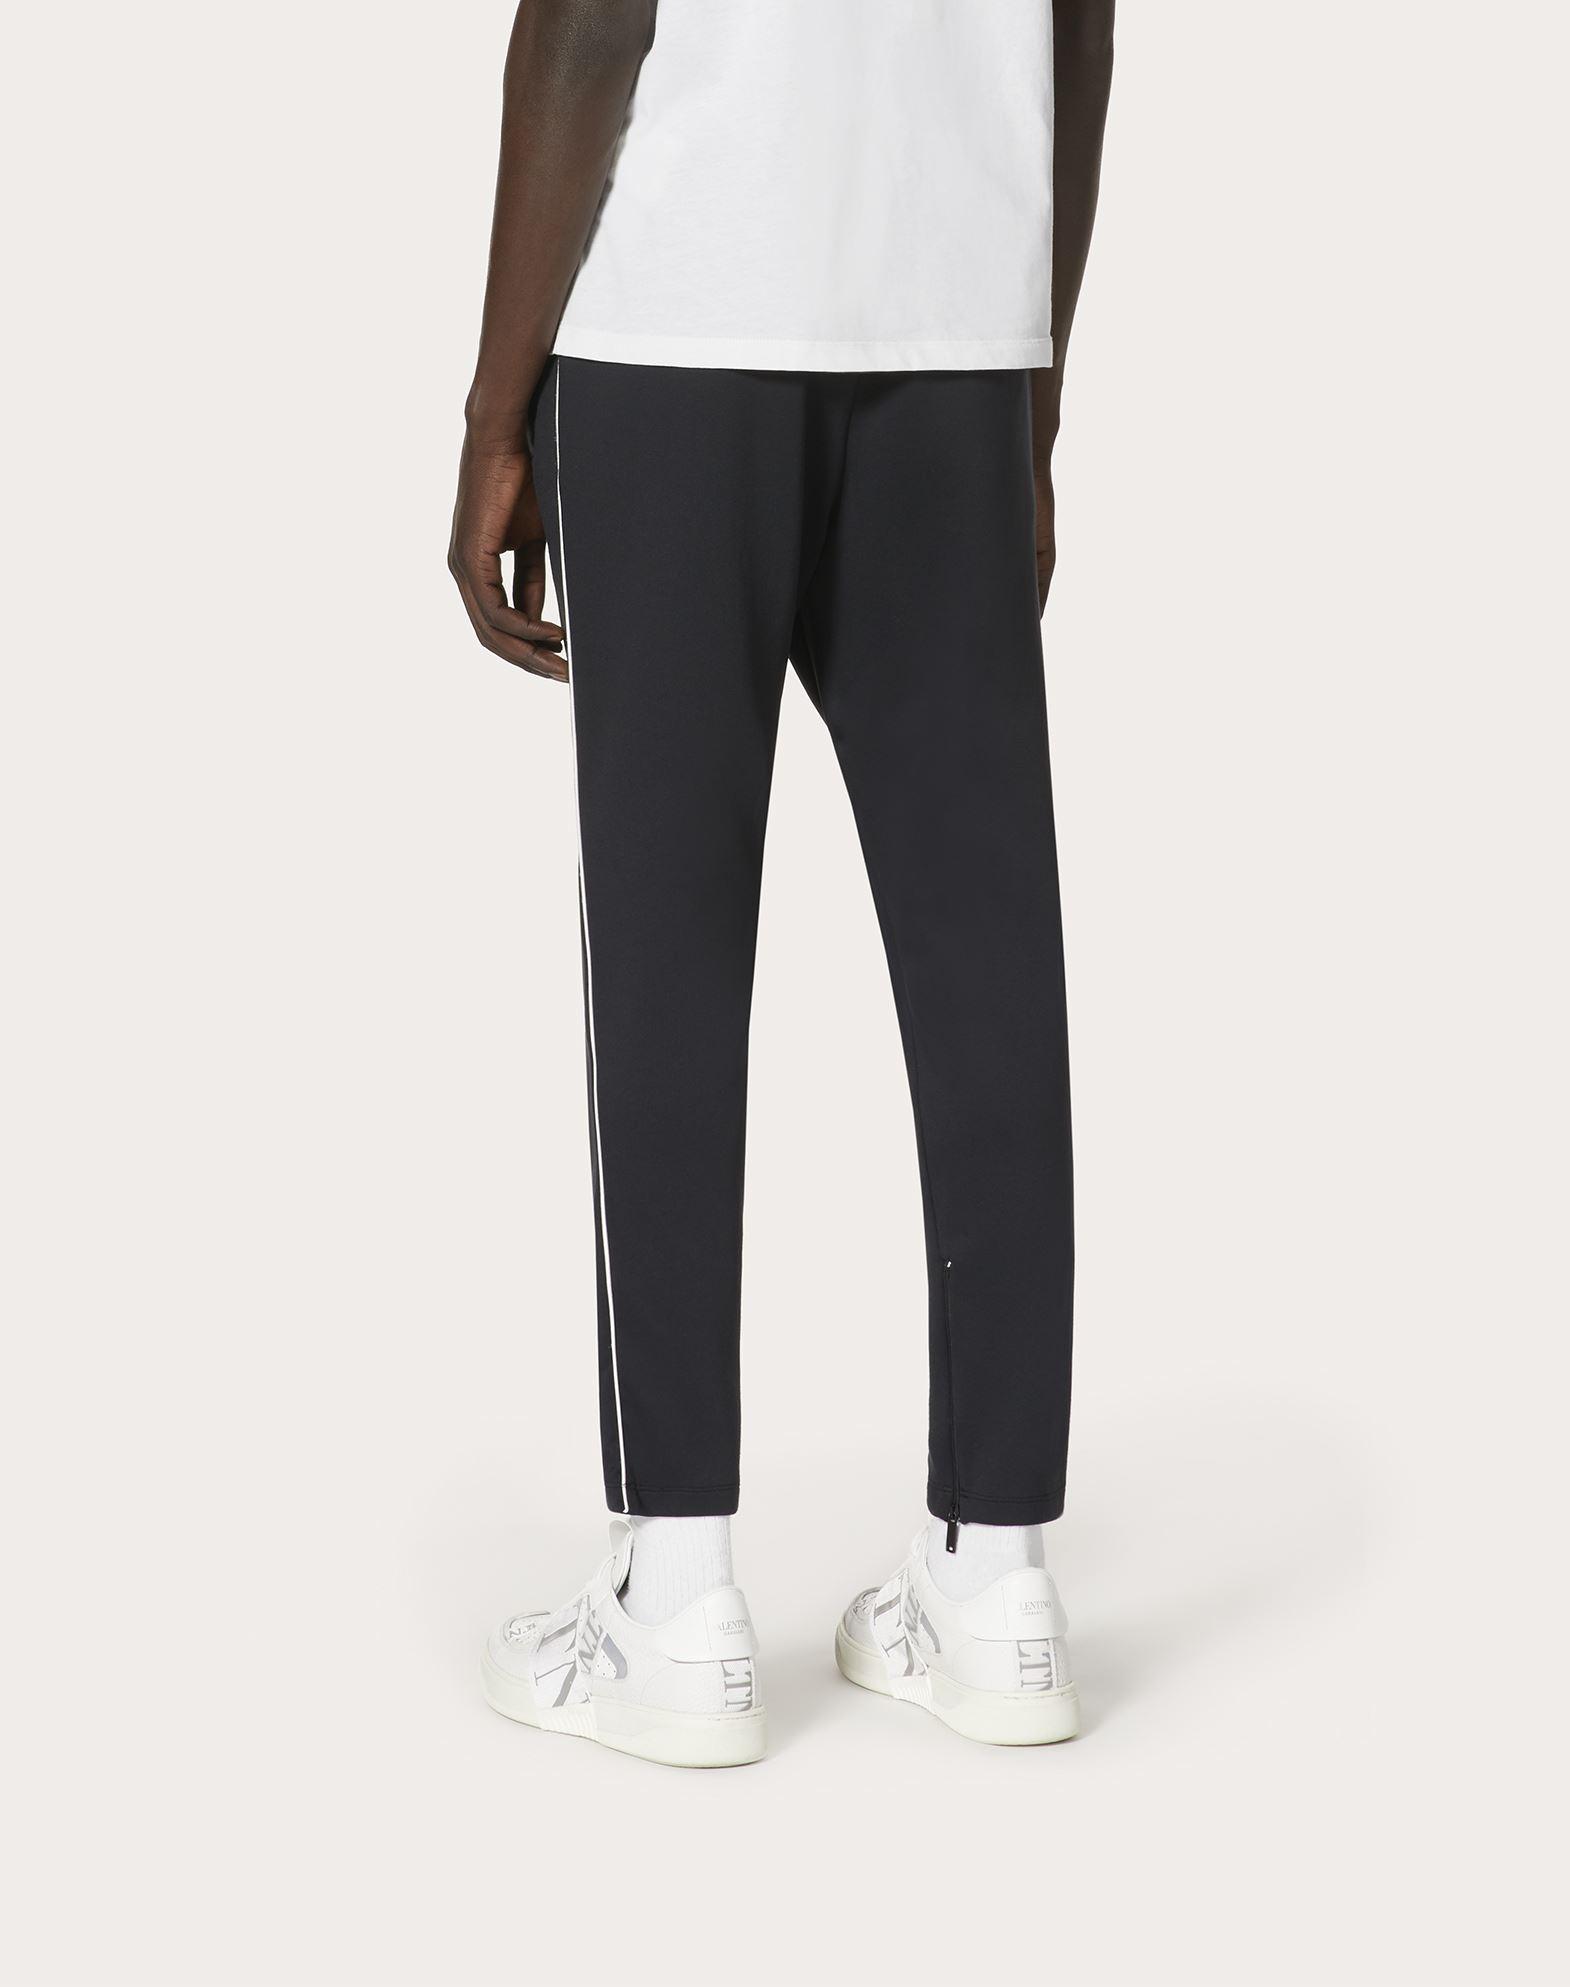 VALENTINO UOMO Pantalones jogger de punto   Pantalón U e